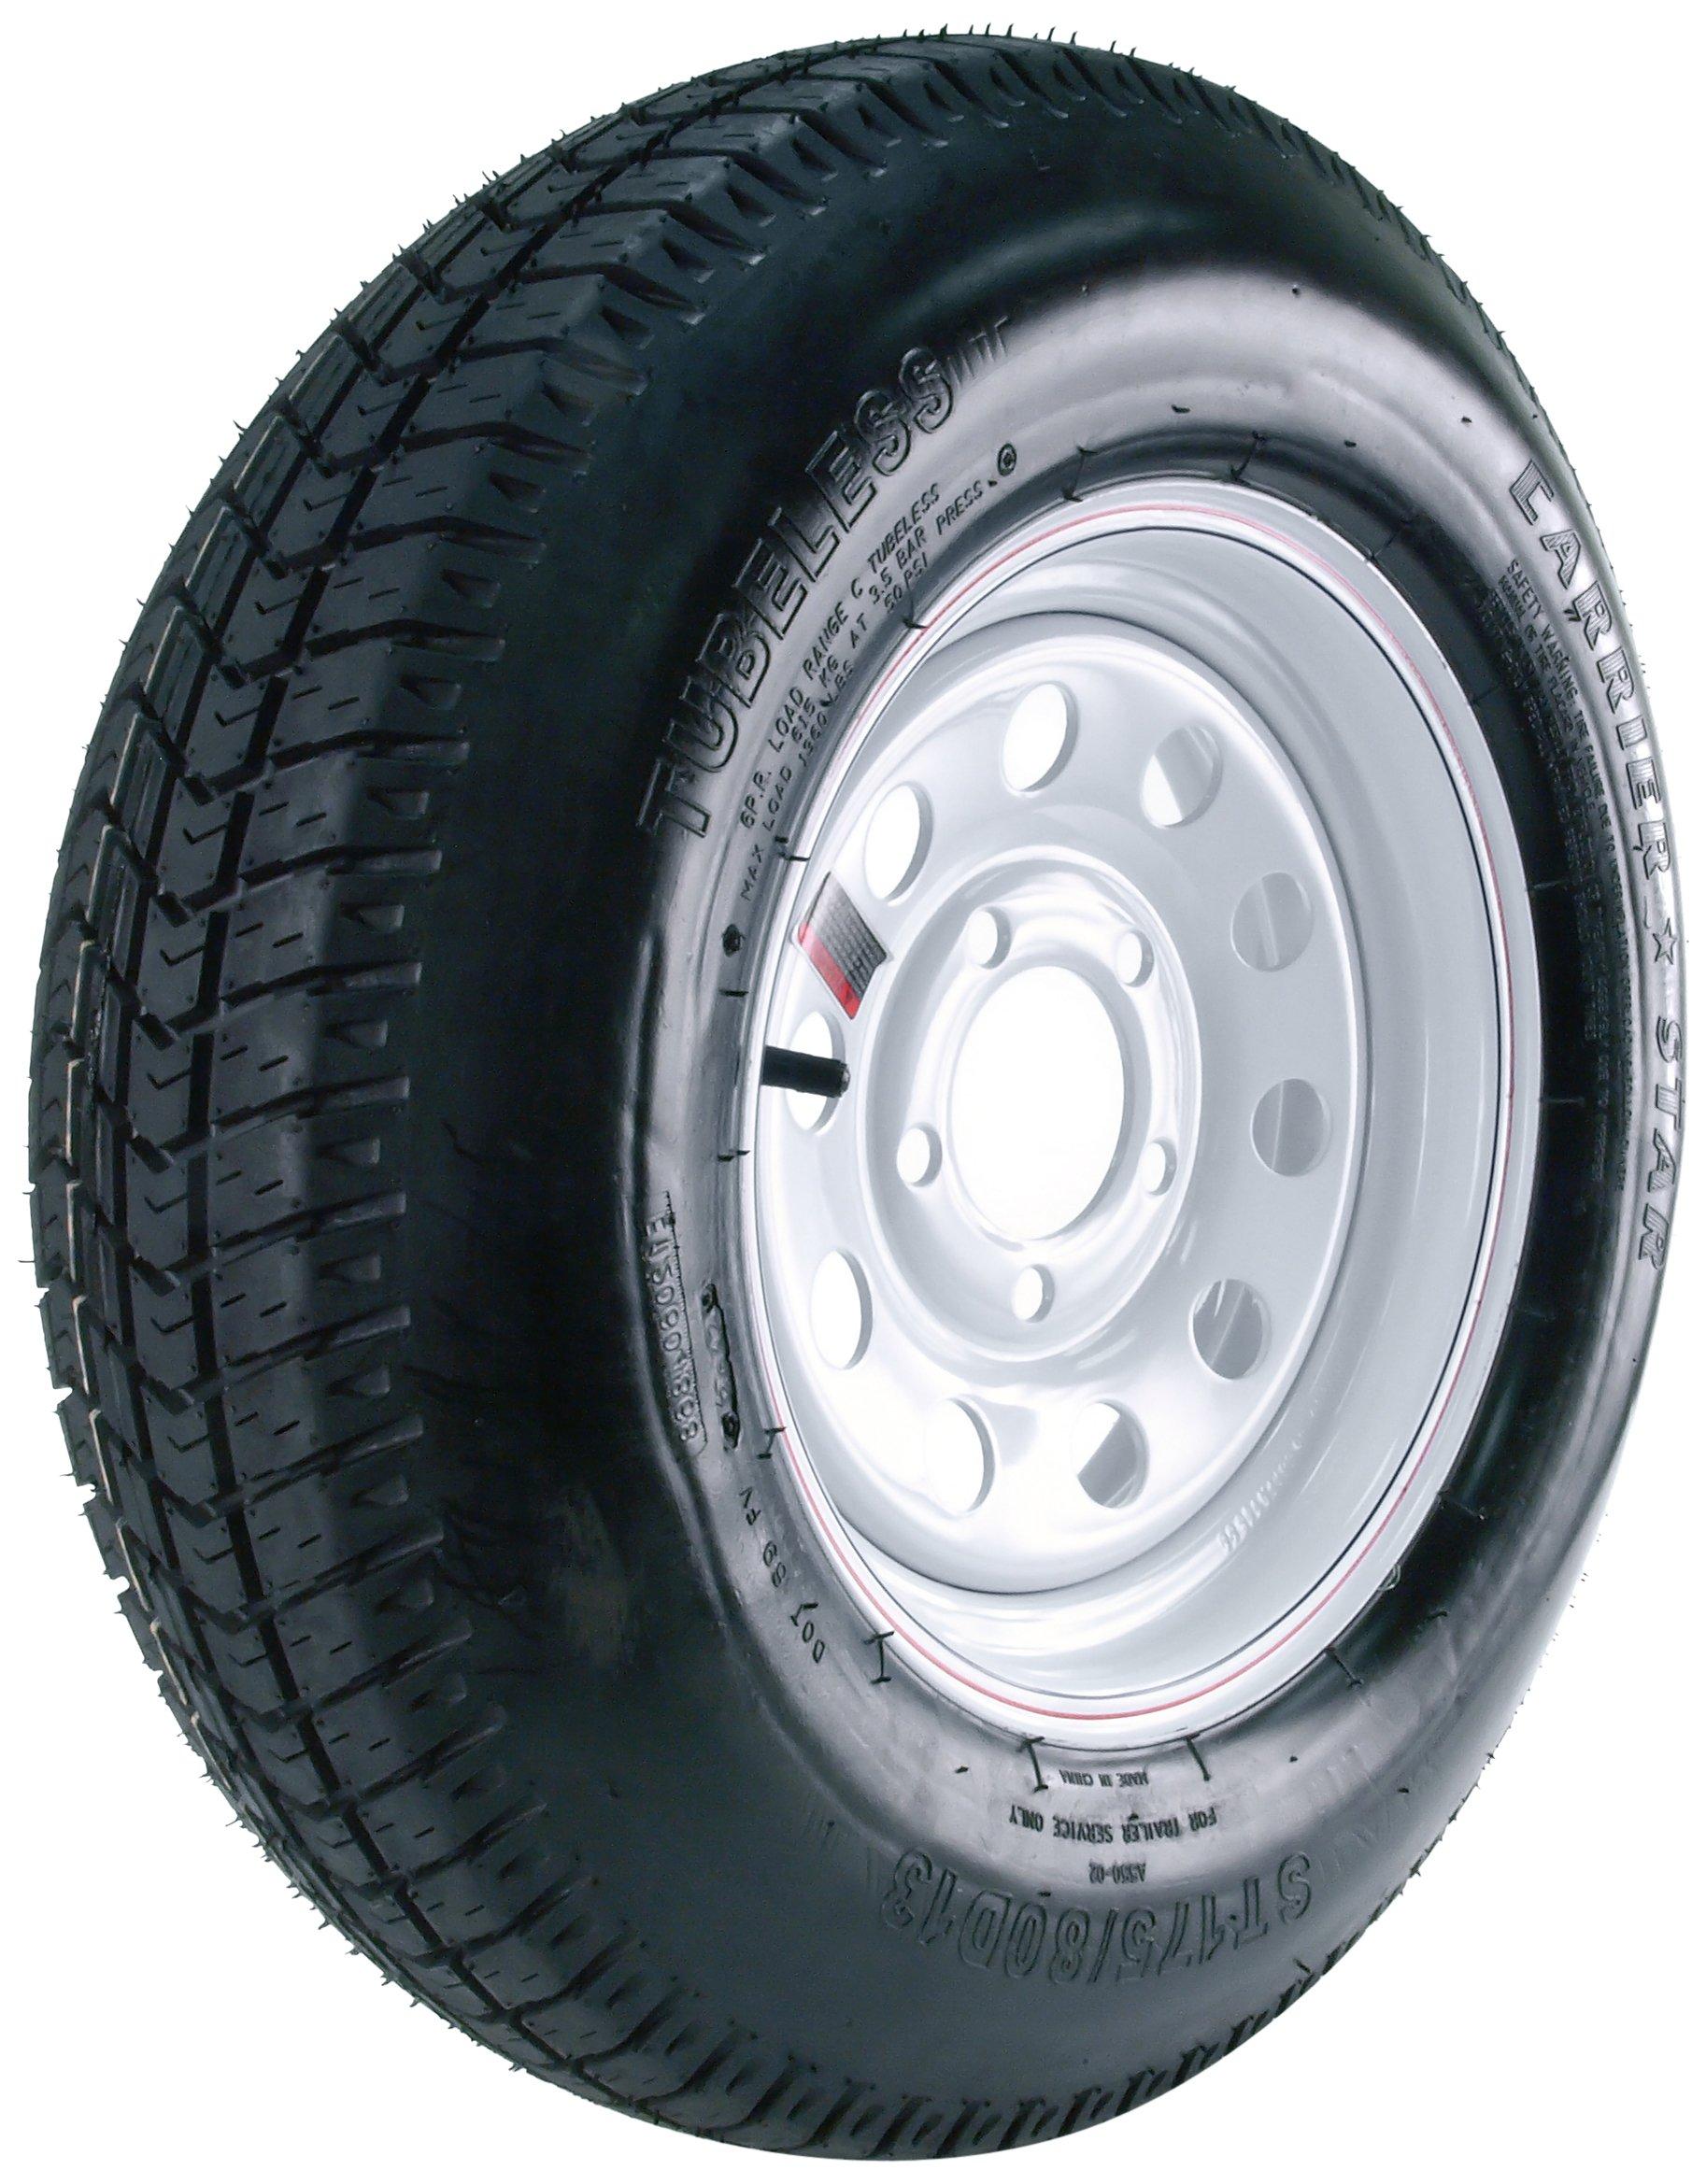 Carrier Star Trailer Tire and 5-Hole Mod Wheel (5/4.5) - 175/80D-13